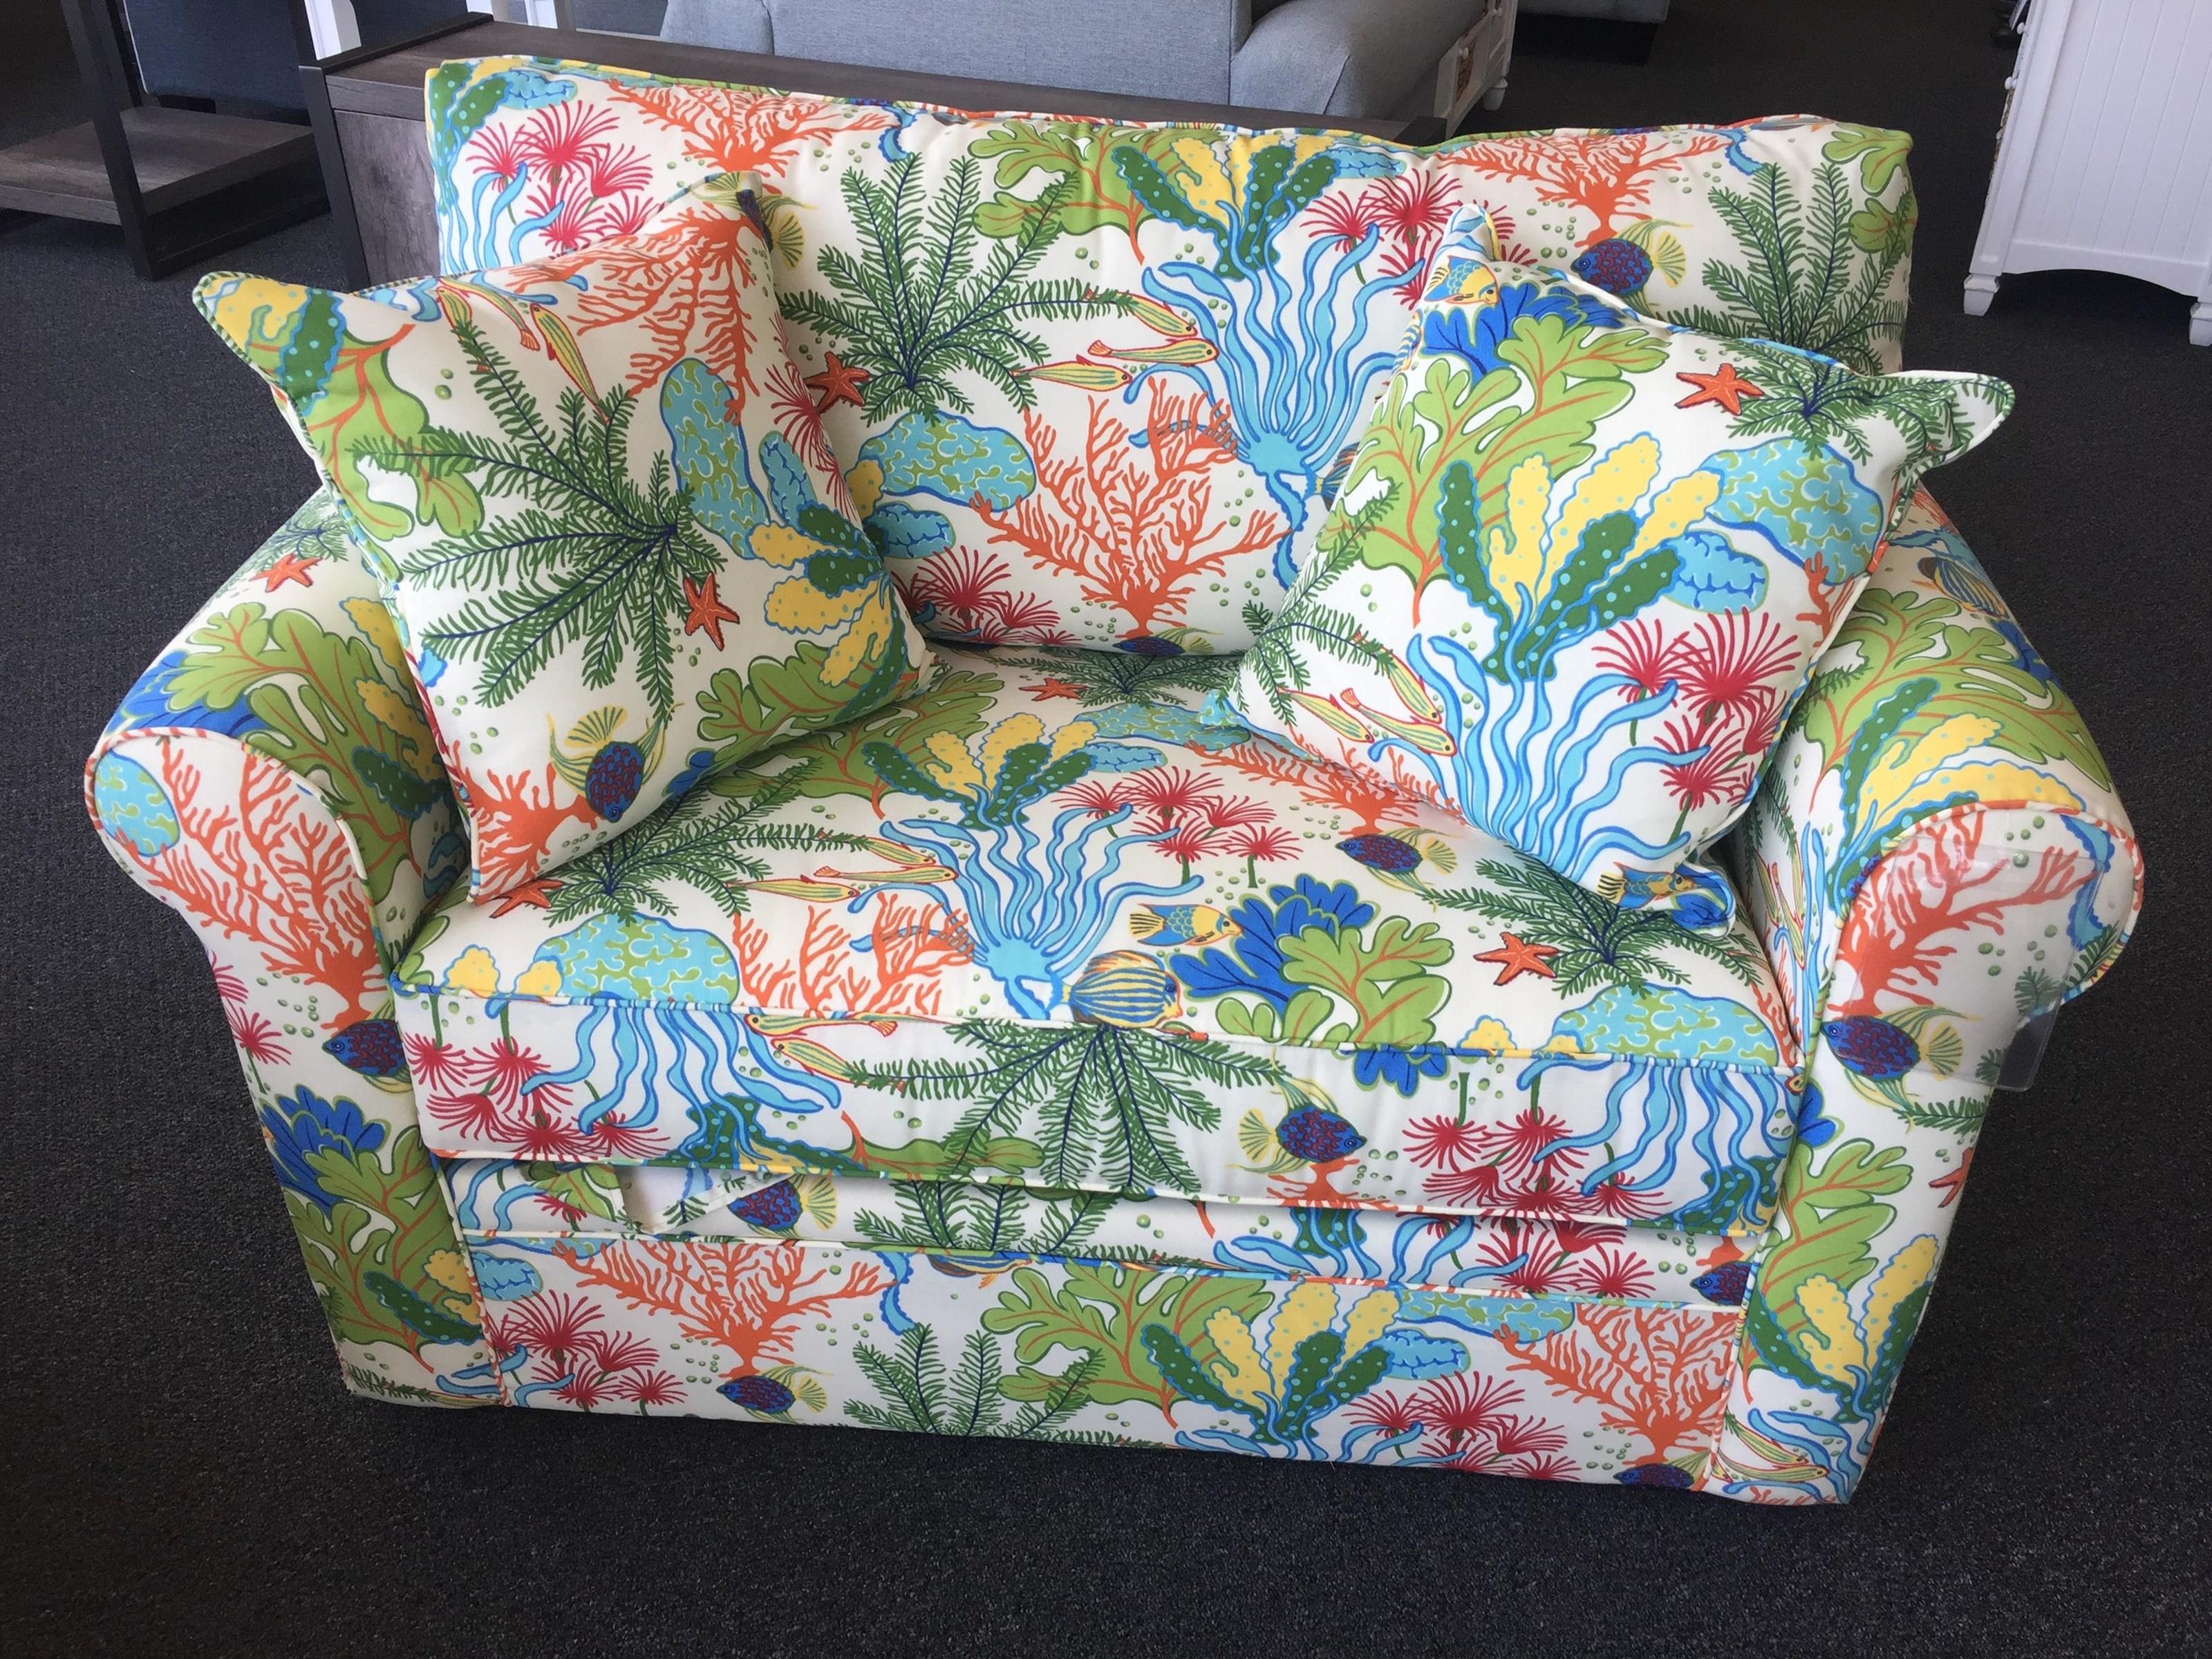 Overnight Sofa 4850 Twin Sleeper Sofa - Item Number: 4850twinsleeper